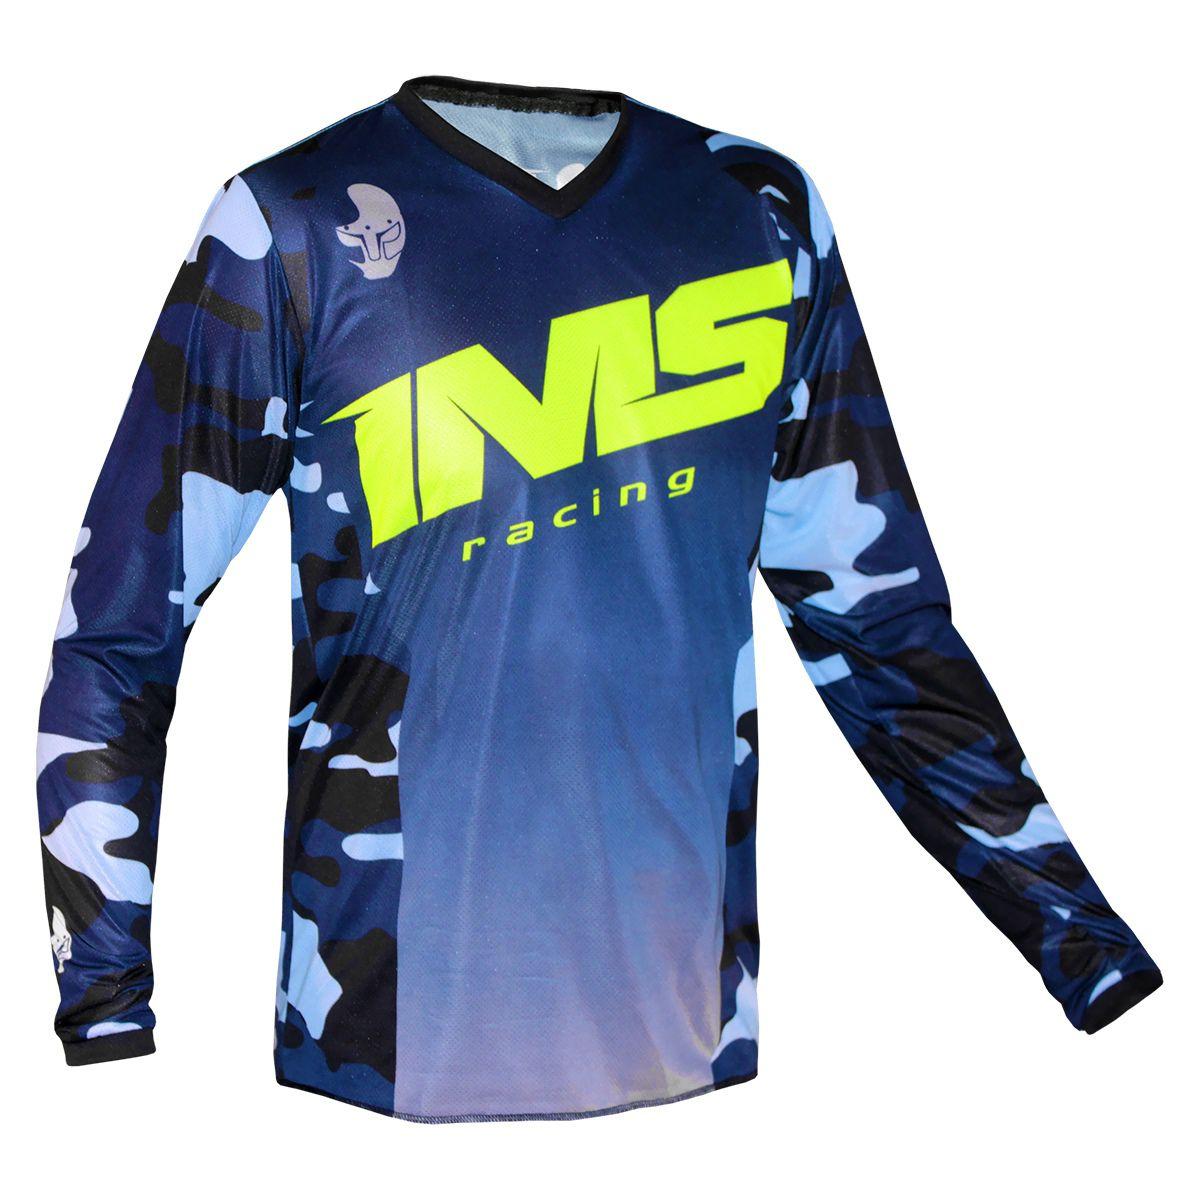 Camisa Ims Army Azul Camuflado Motocross Trilha